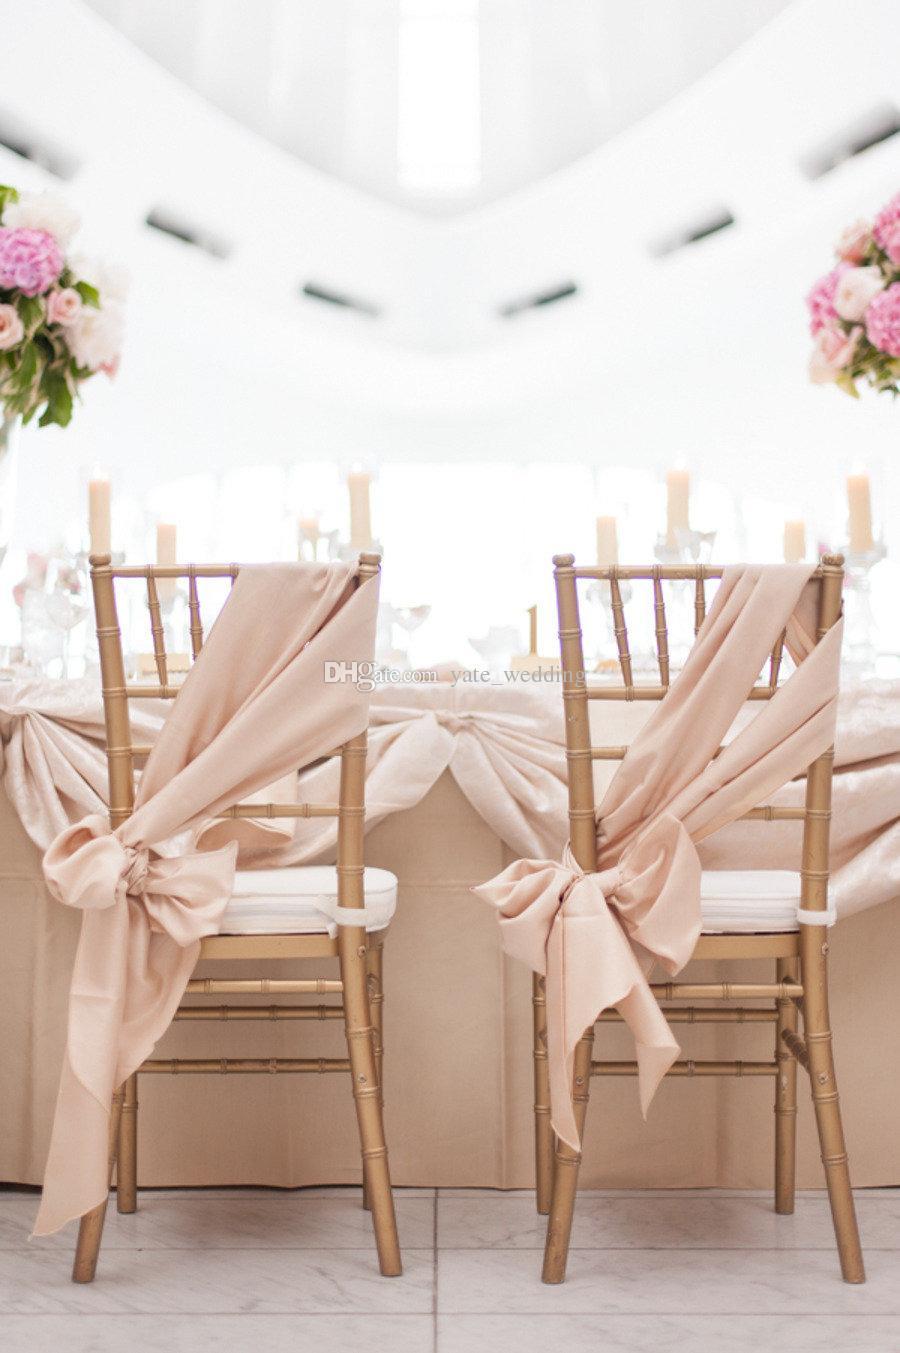 champagne chair sashes diy wedding chair decorations 200* 50cm